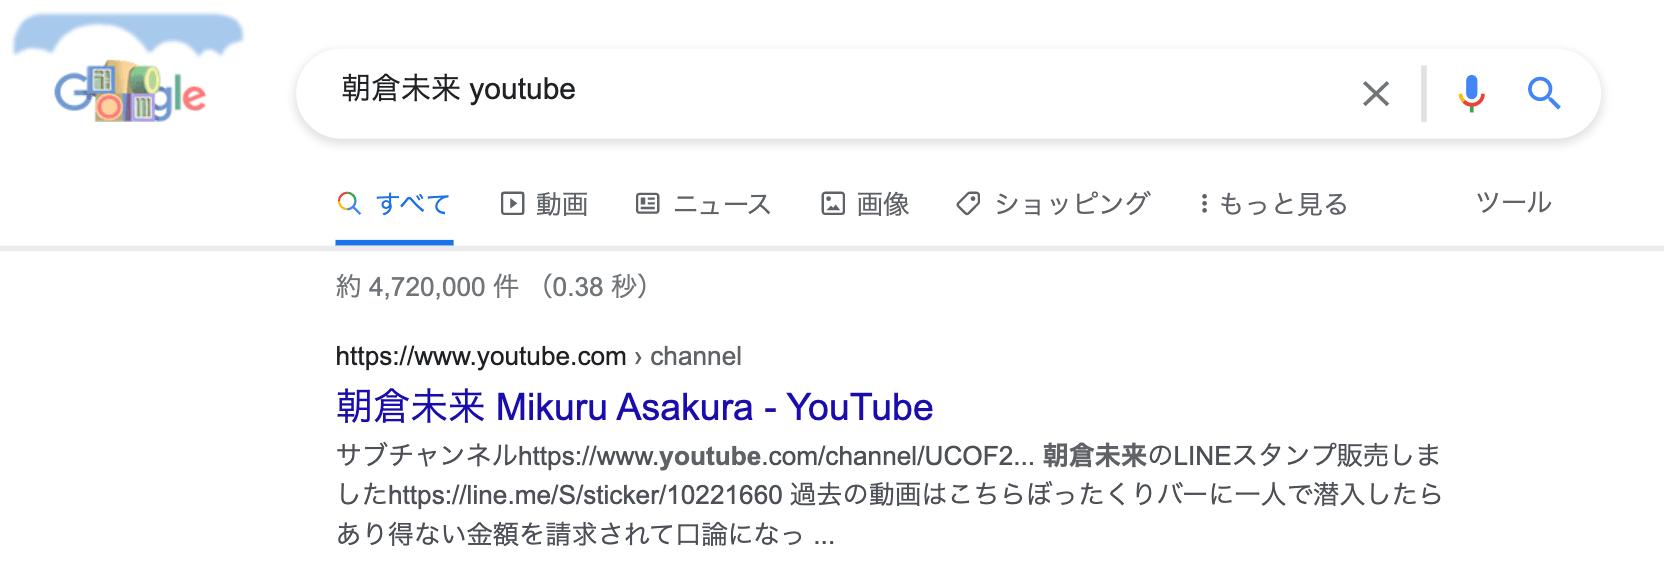 mikuru asakura youtube-google search